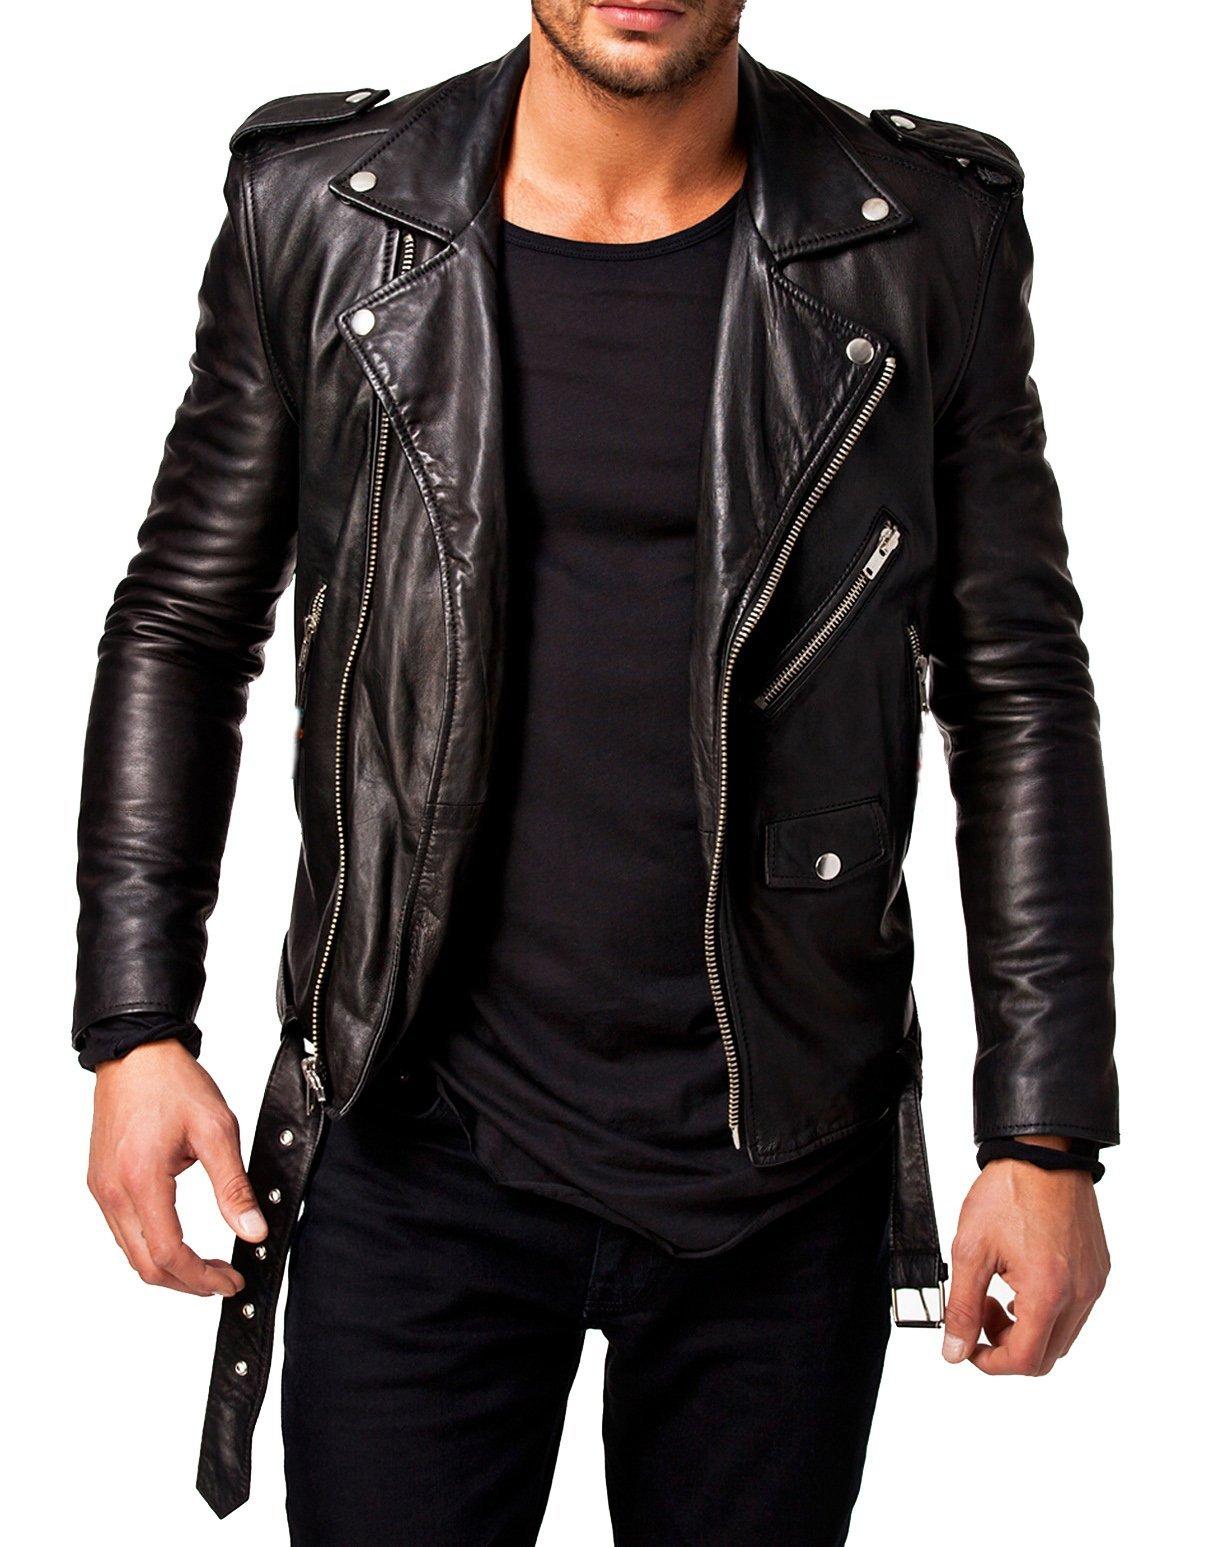 Best Seller Leather Men's Leather Jacket S Black by Best Seller Leather